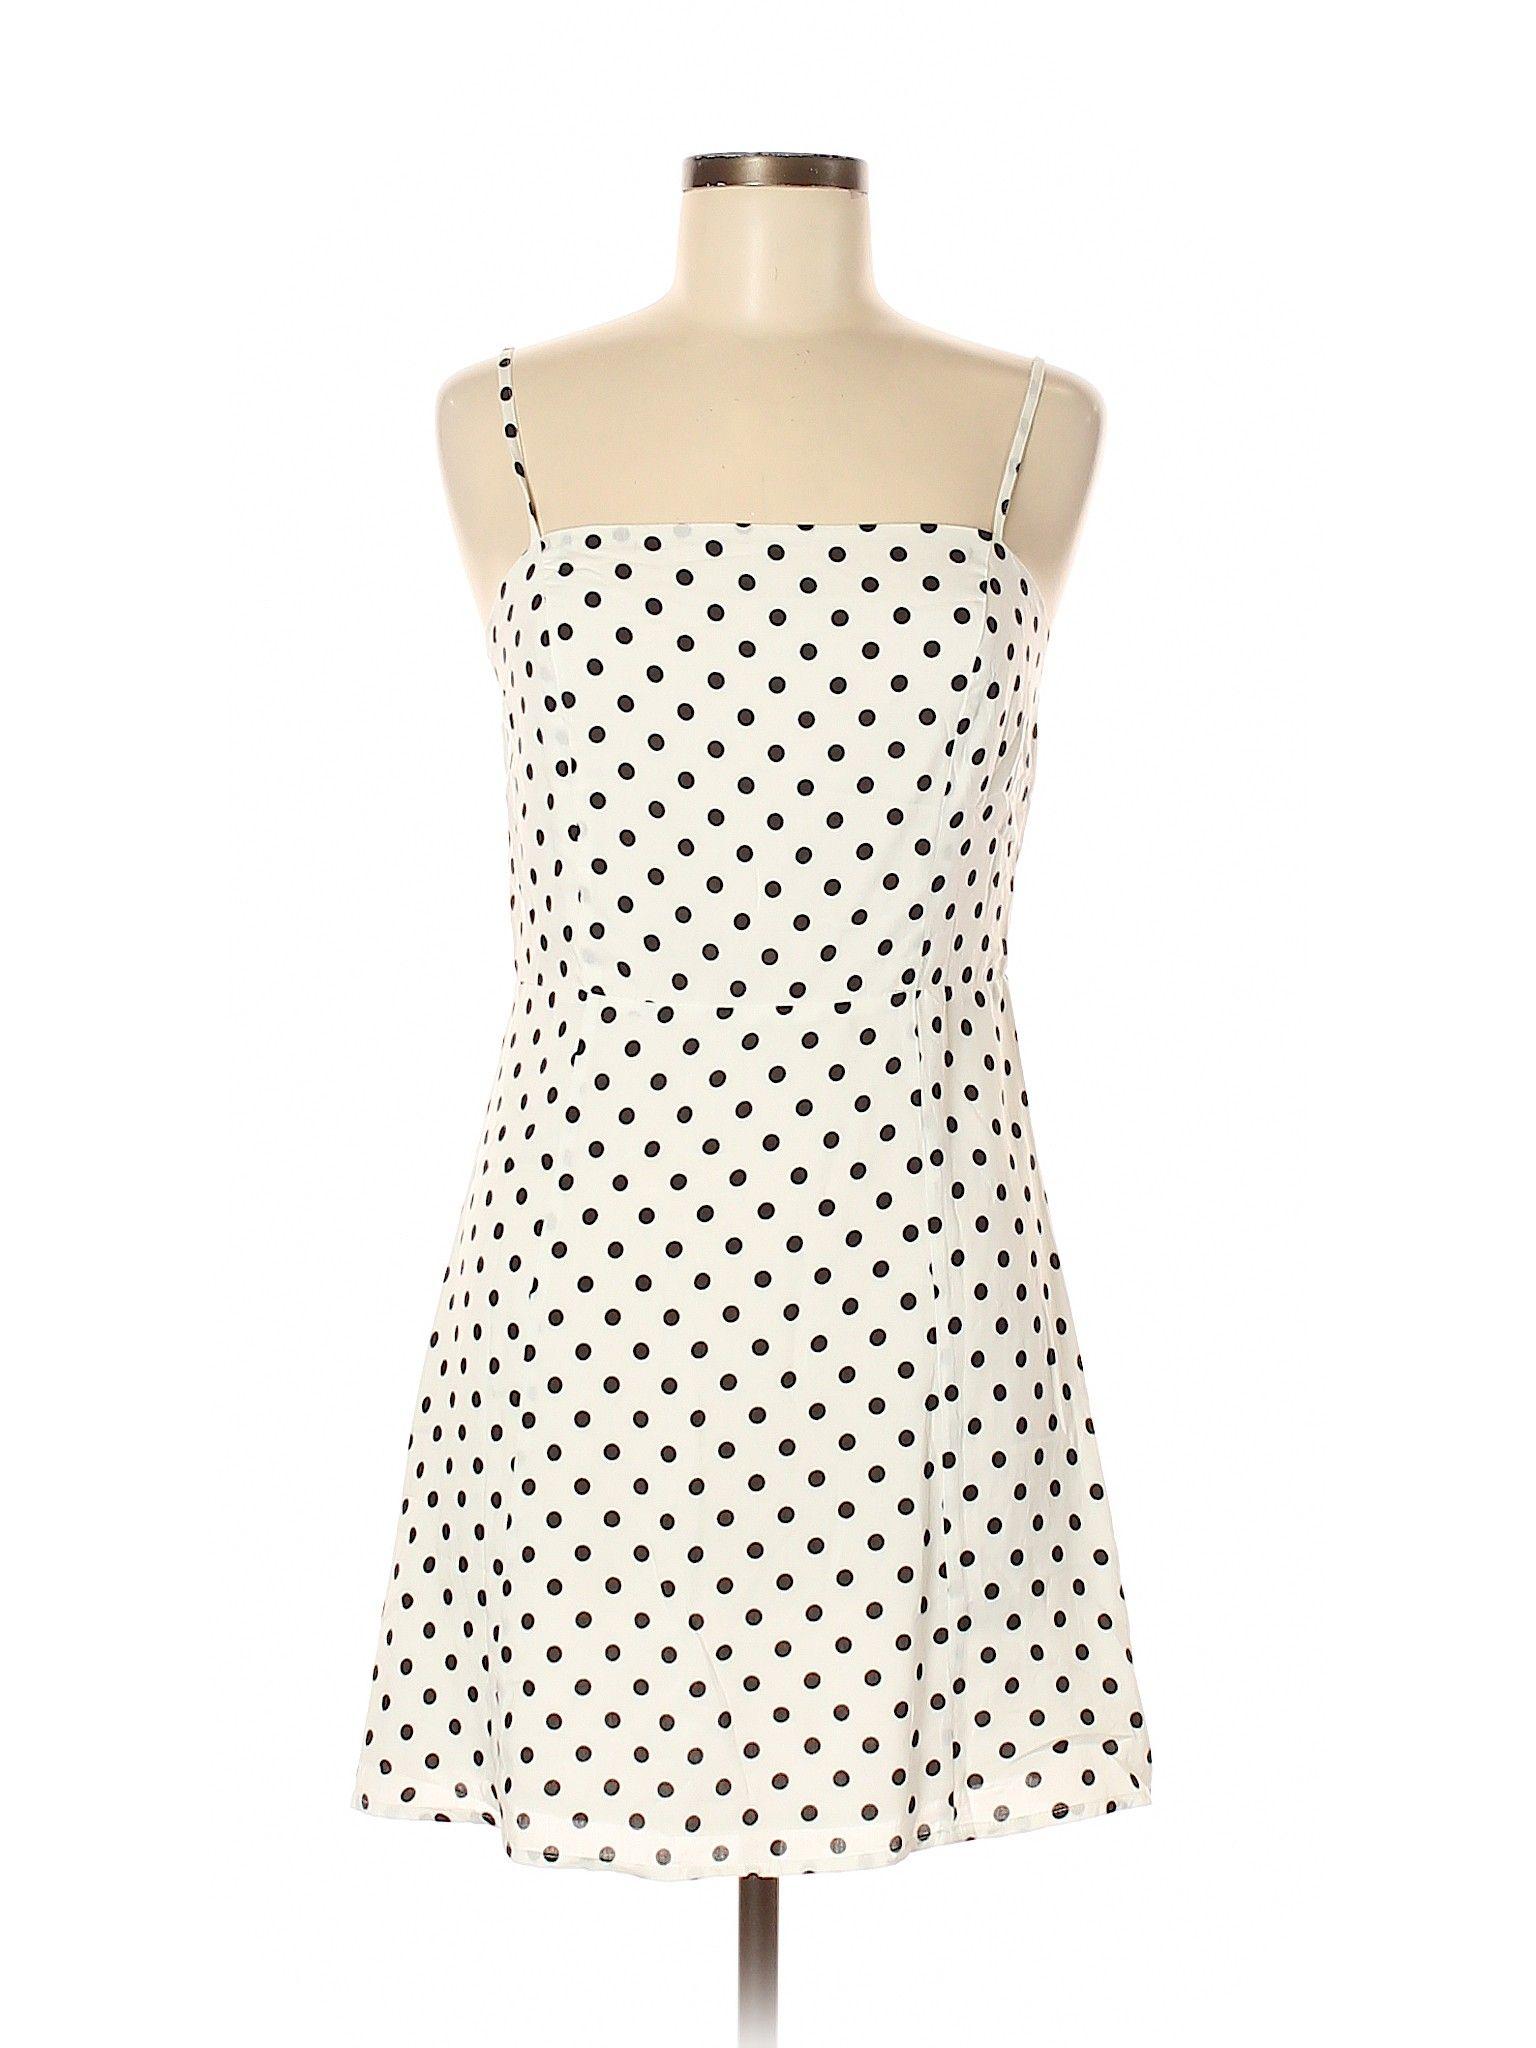 Market Casual Dress Slip Dress Ivory Polka Dots Dresses Used Size Medium Second Hand Clothes Casual Dresses Fashion